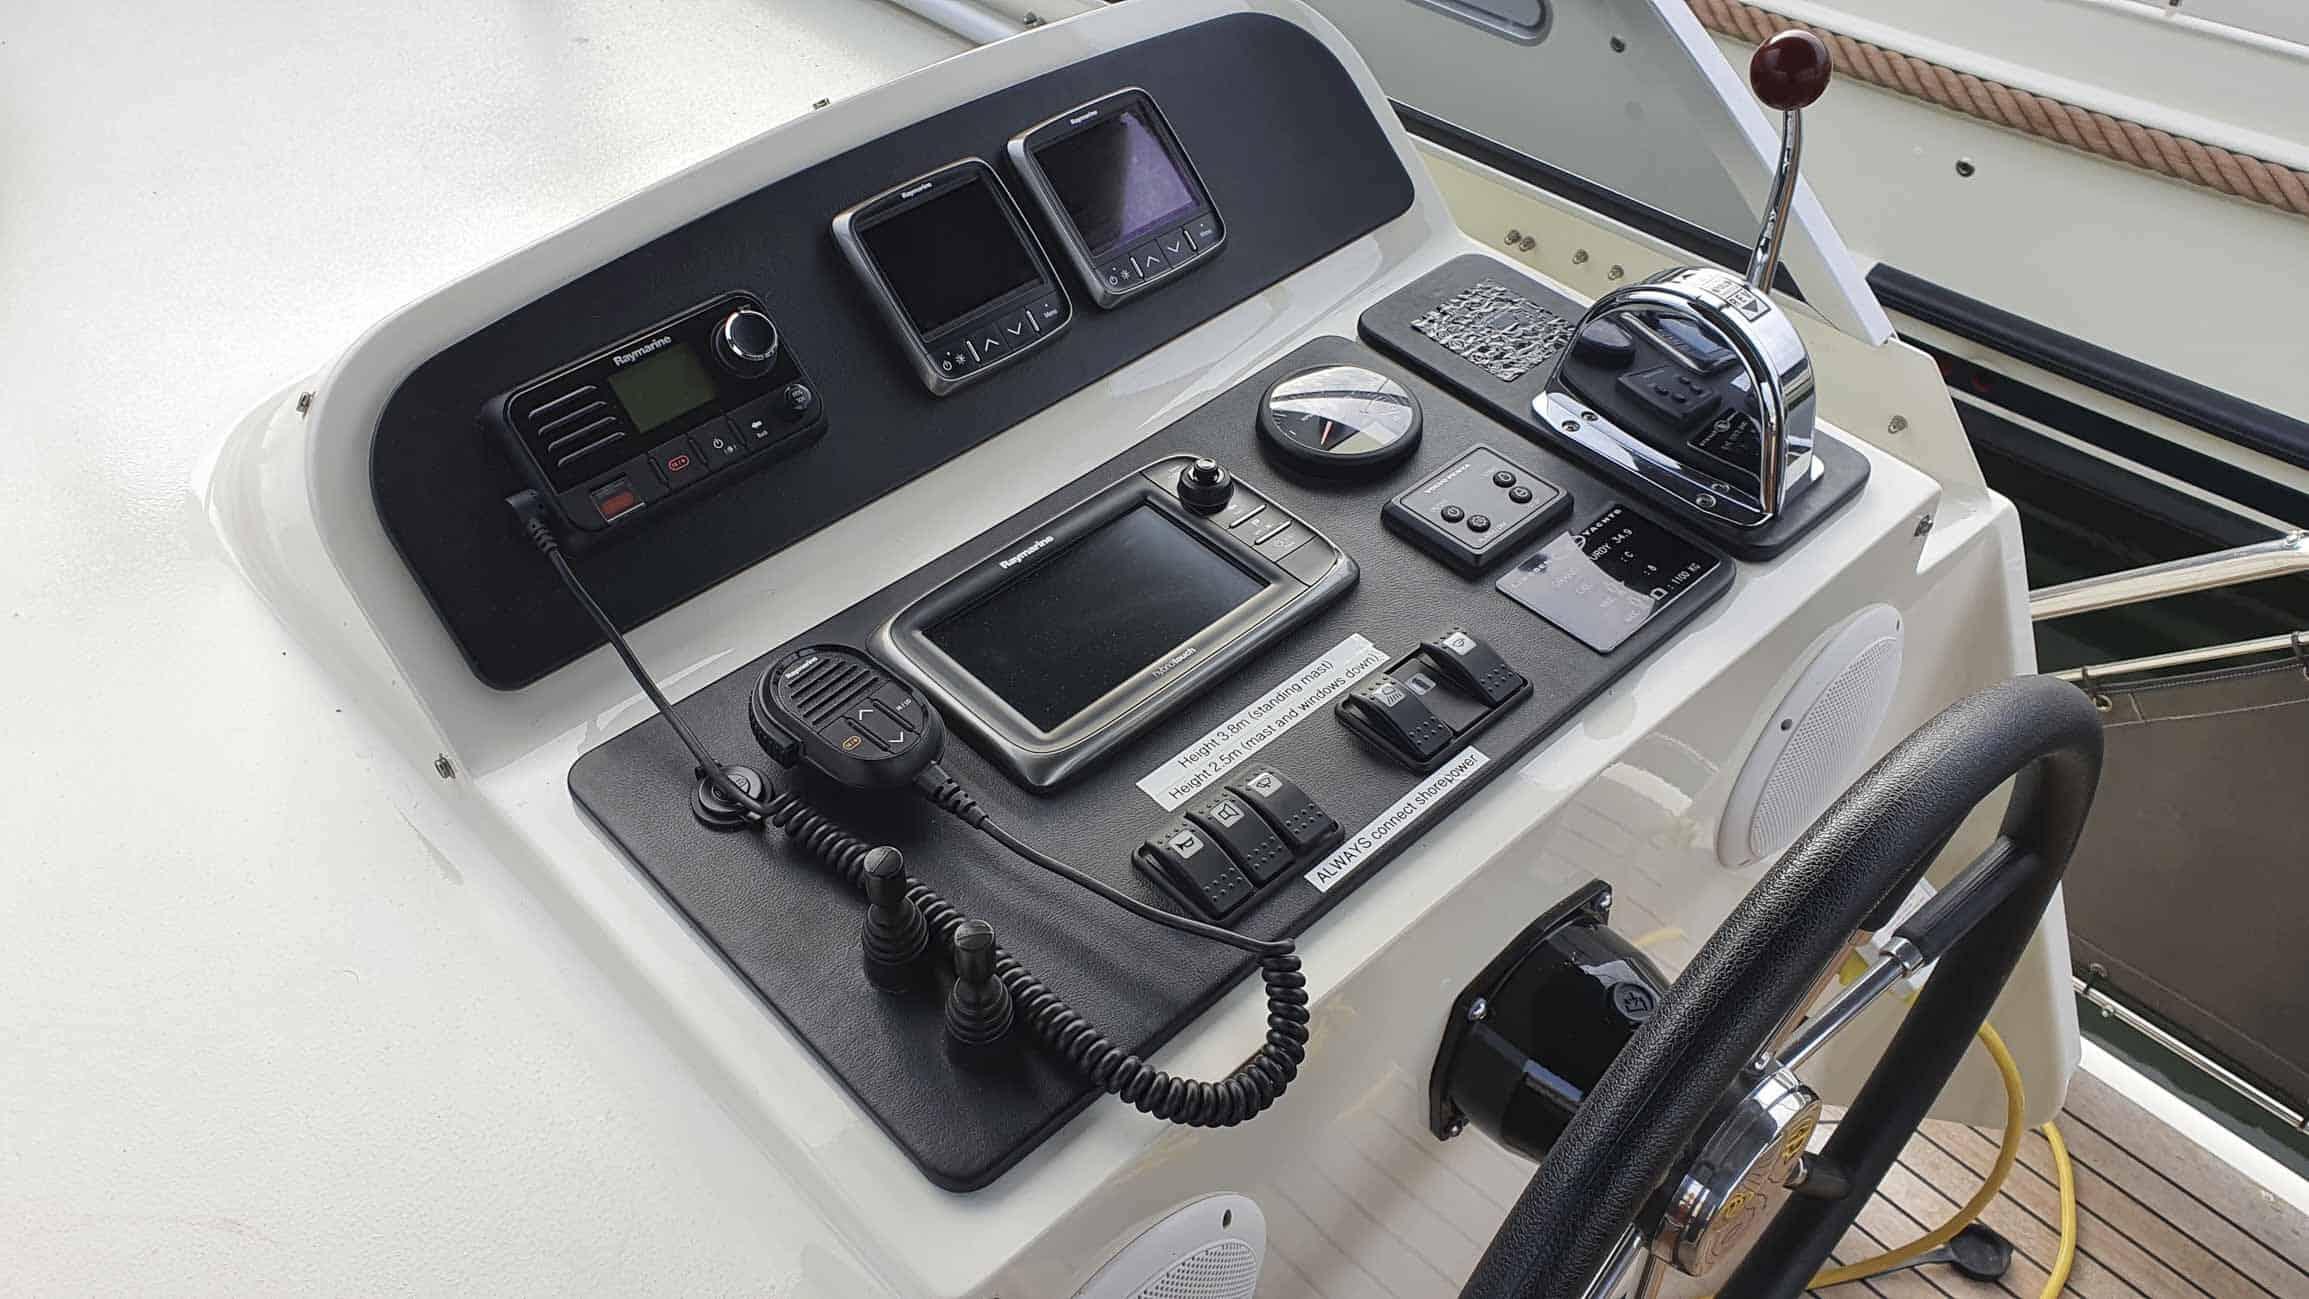 gebruikt-motorjacht-grand-sturdy-34-9-ac-3115-024